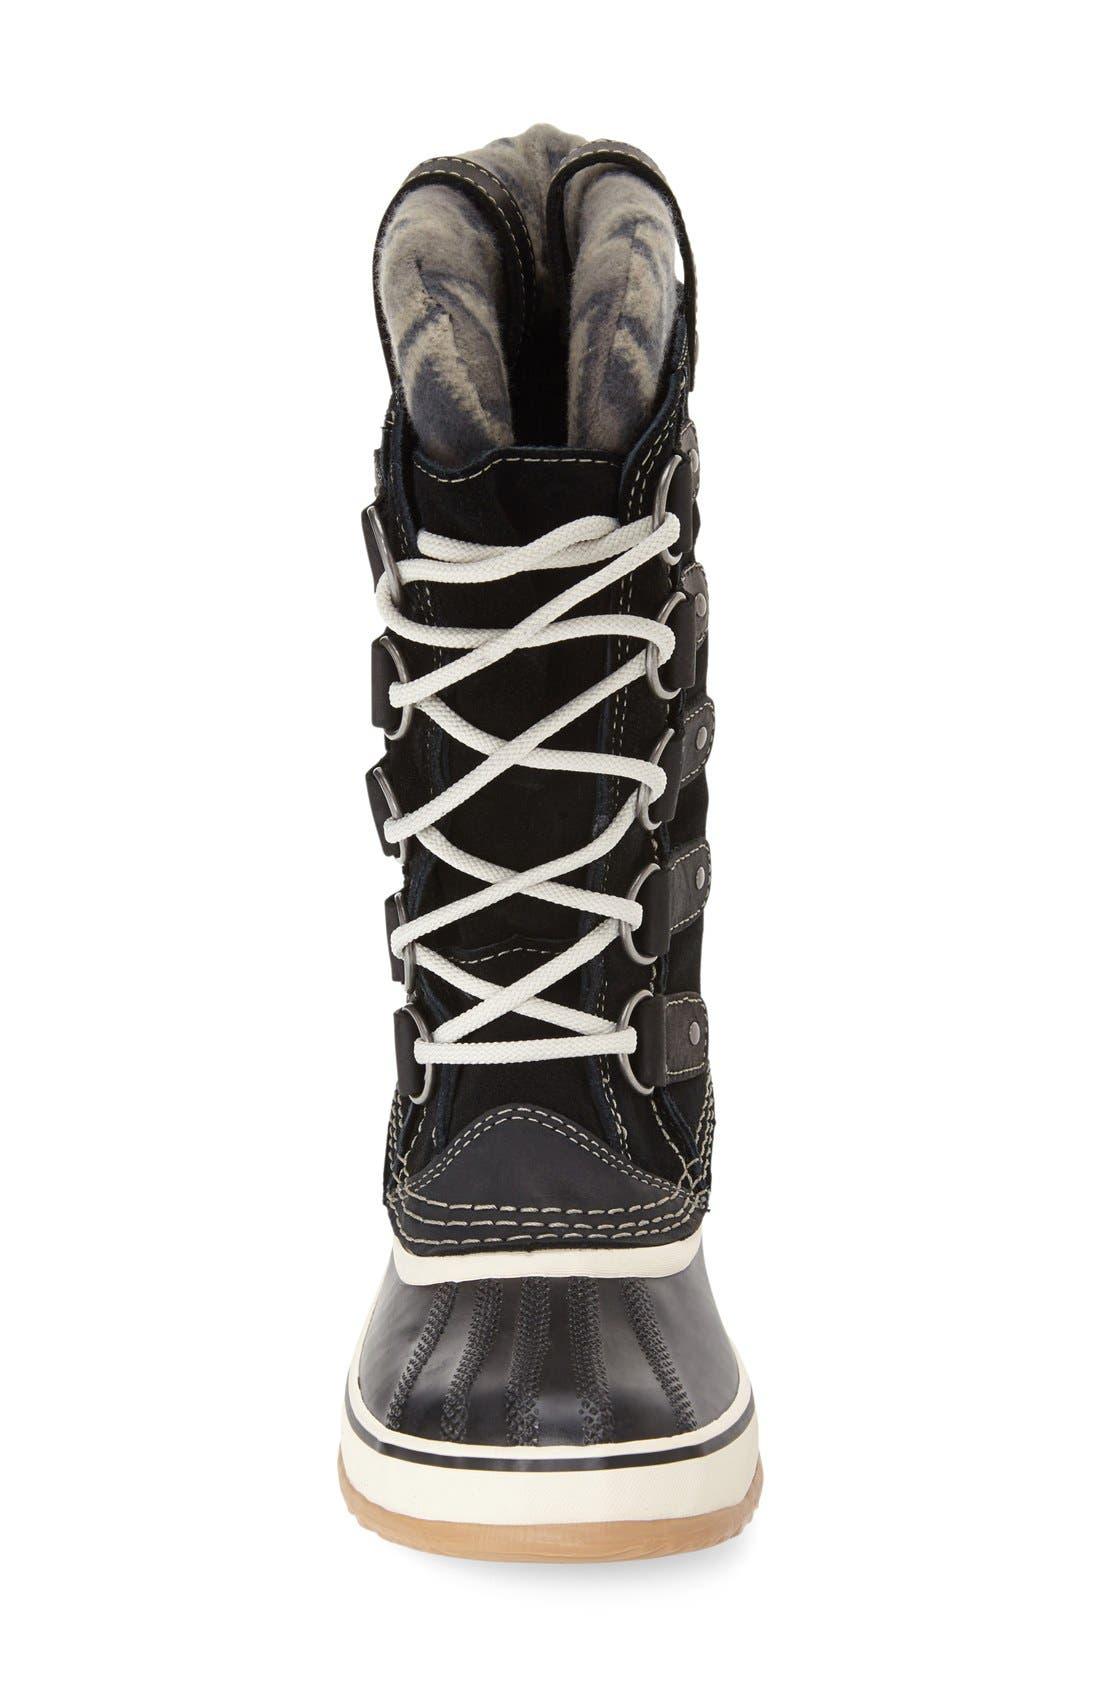 'Joan of Arctic - Knit II' Waterproof Boot,                             Alternate thumbnail 3, color,                             Black